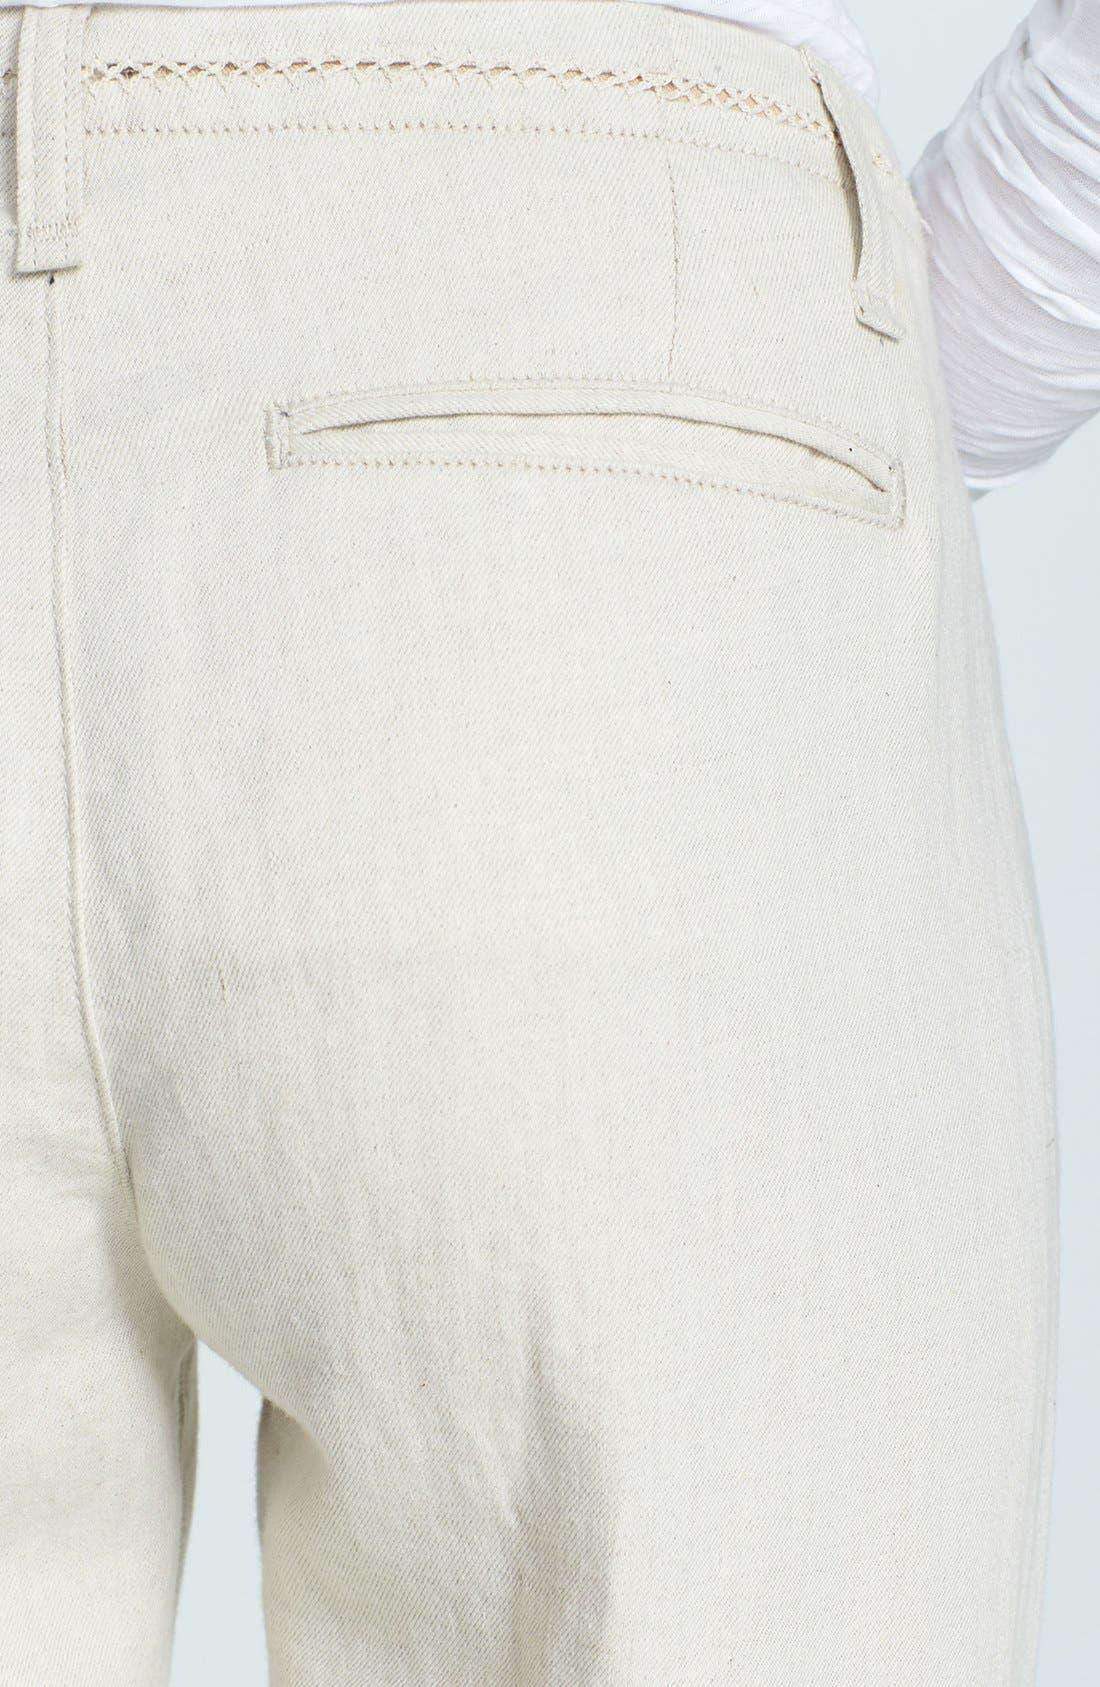 Alternate Image 3  - rag & bone/JEAN 'Separating Portobello' Open Detail Pants